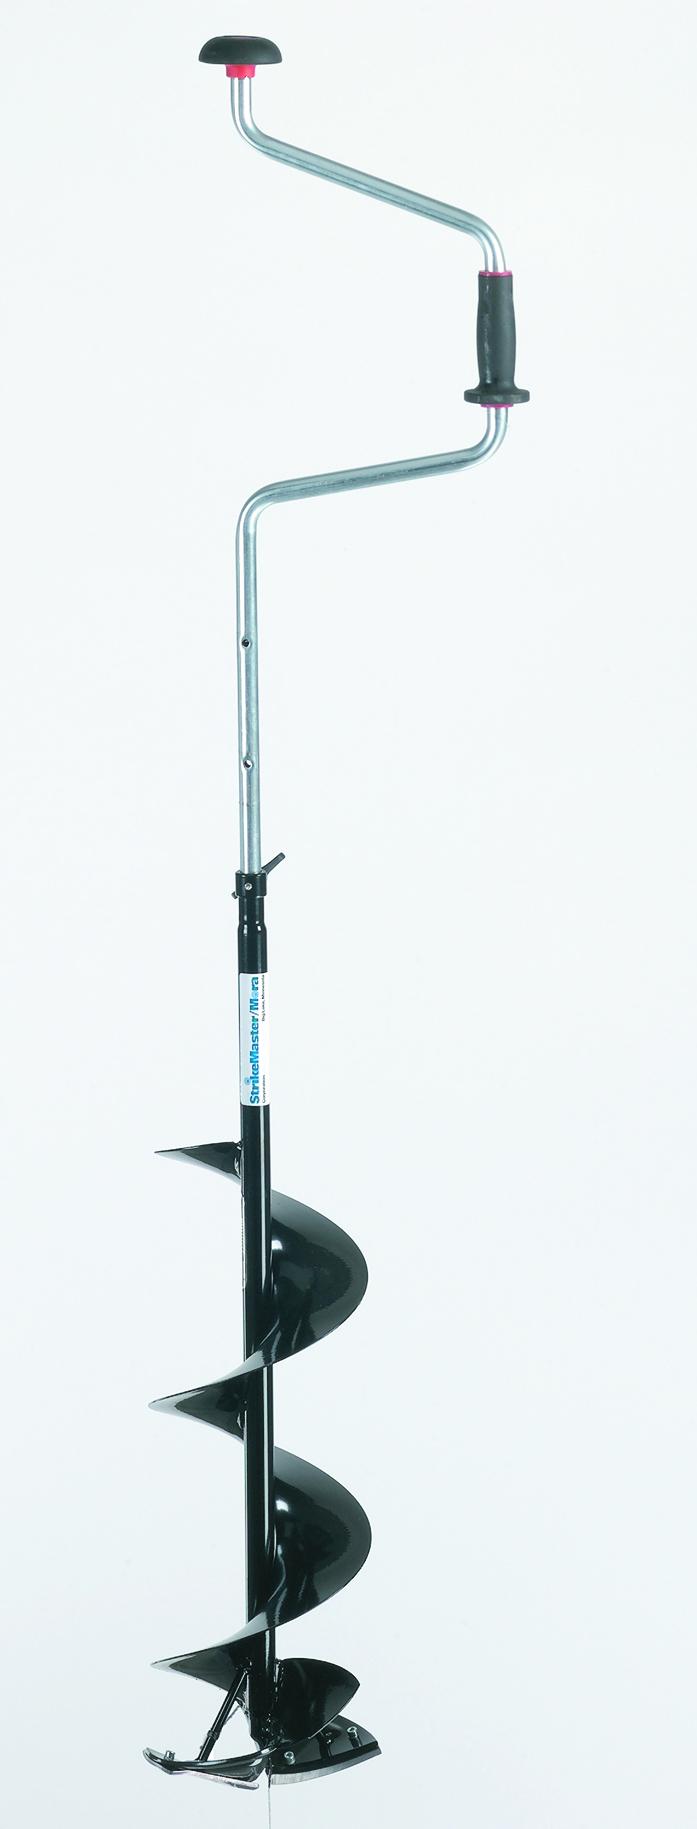 StrikeMaster LD-8 Lazer 2pc Hand Ice Auger 8